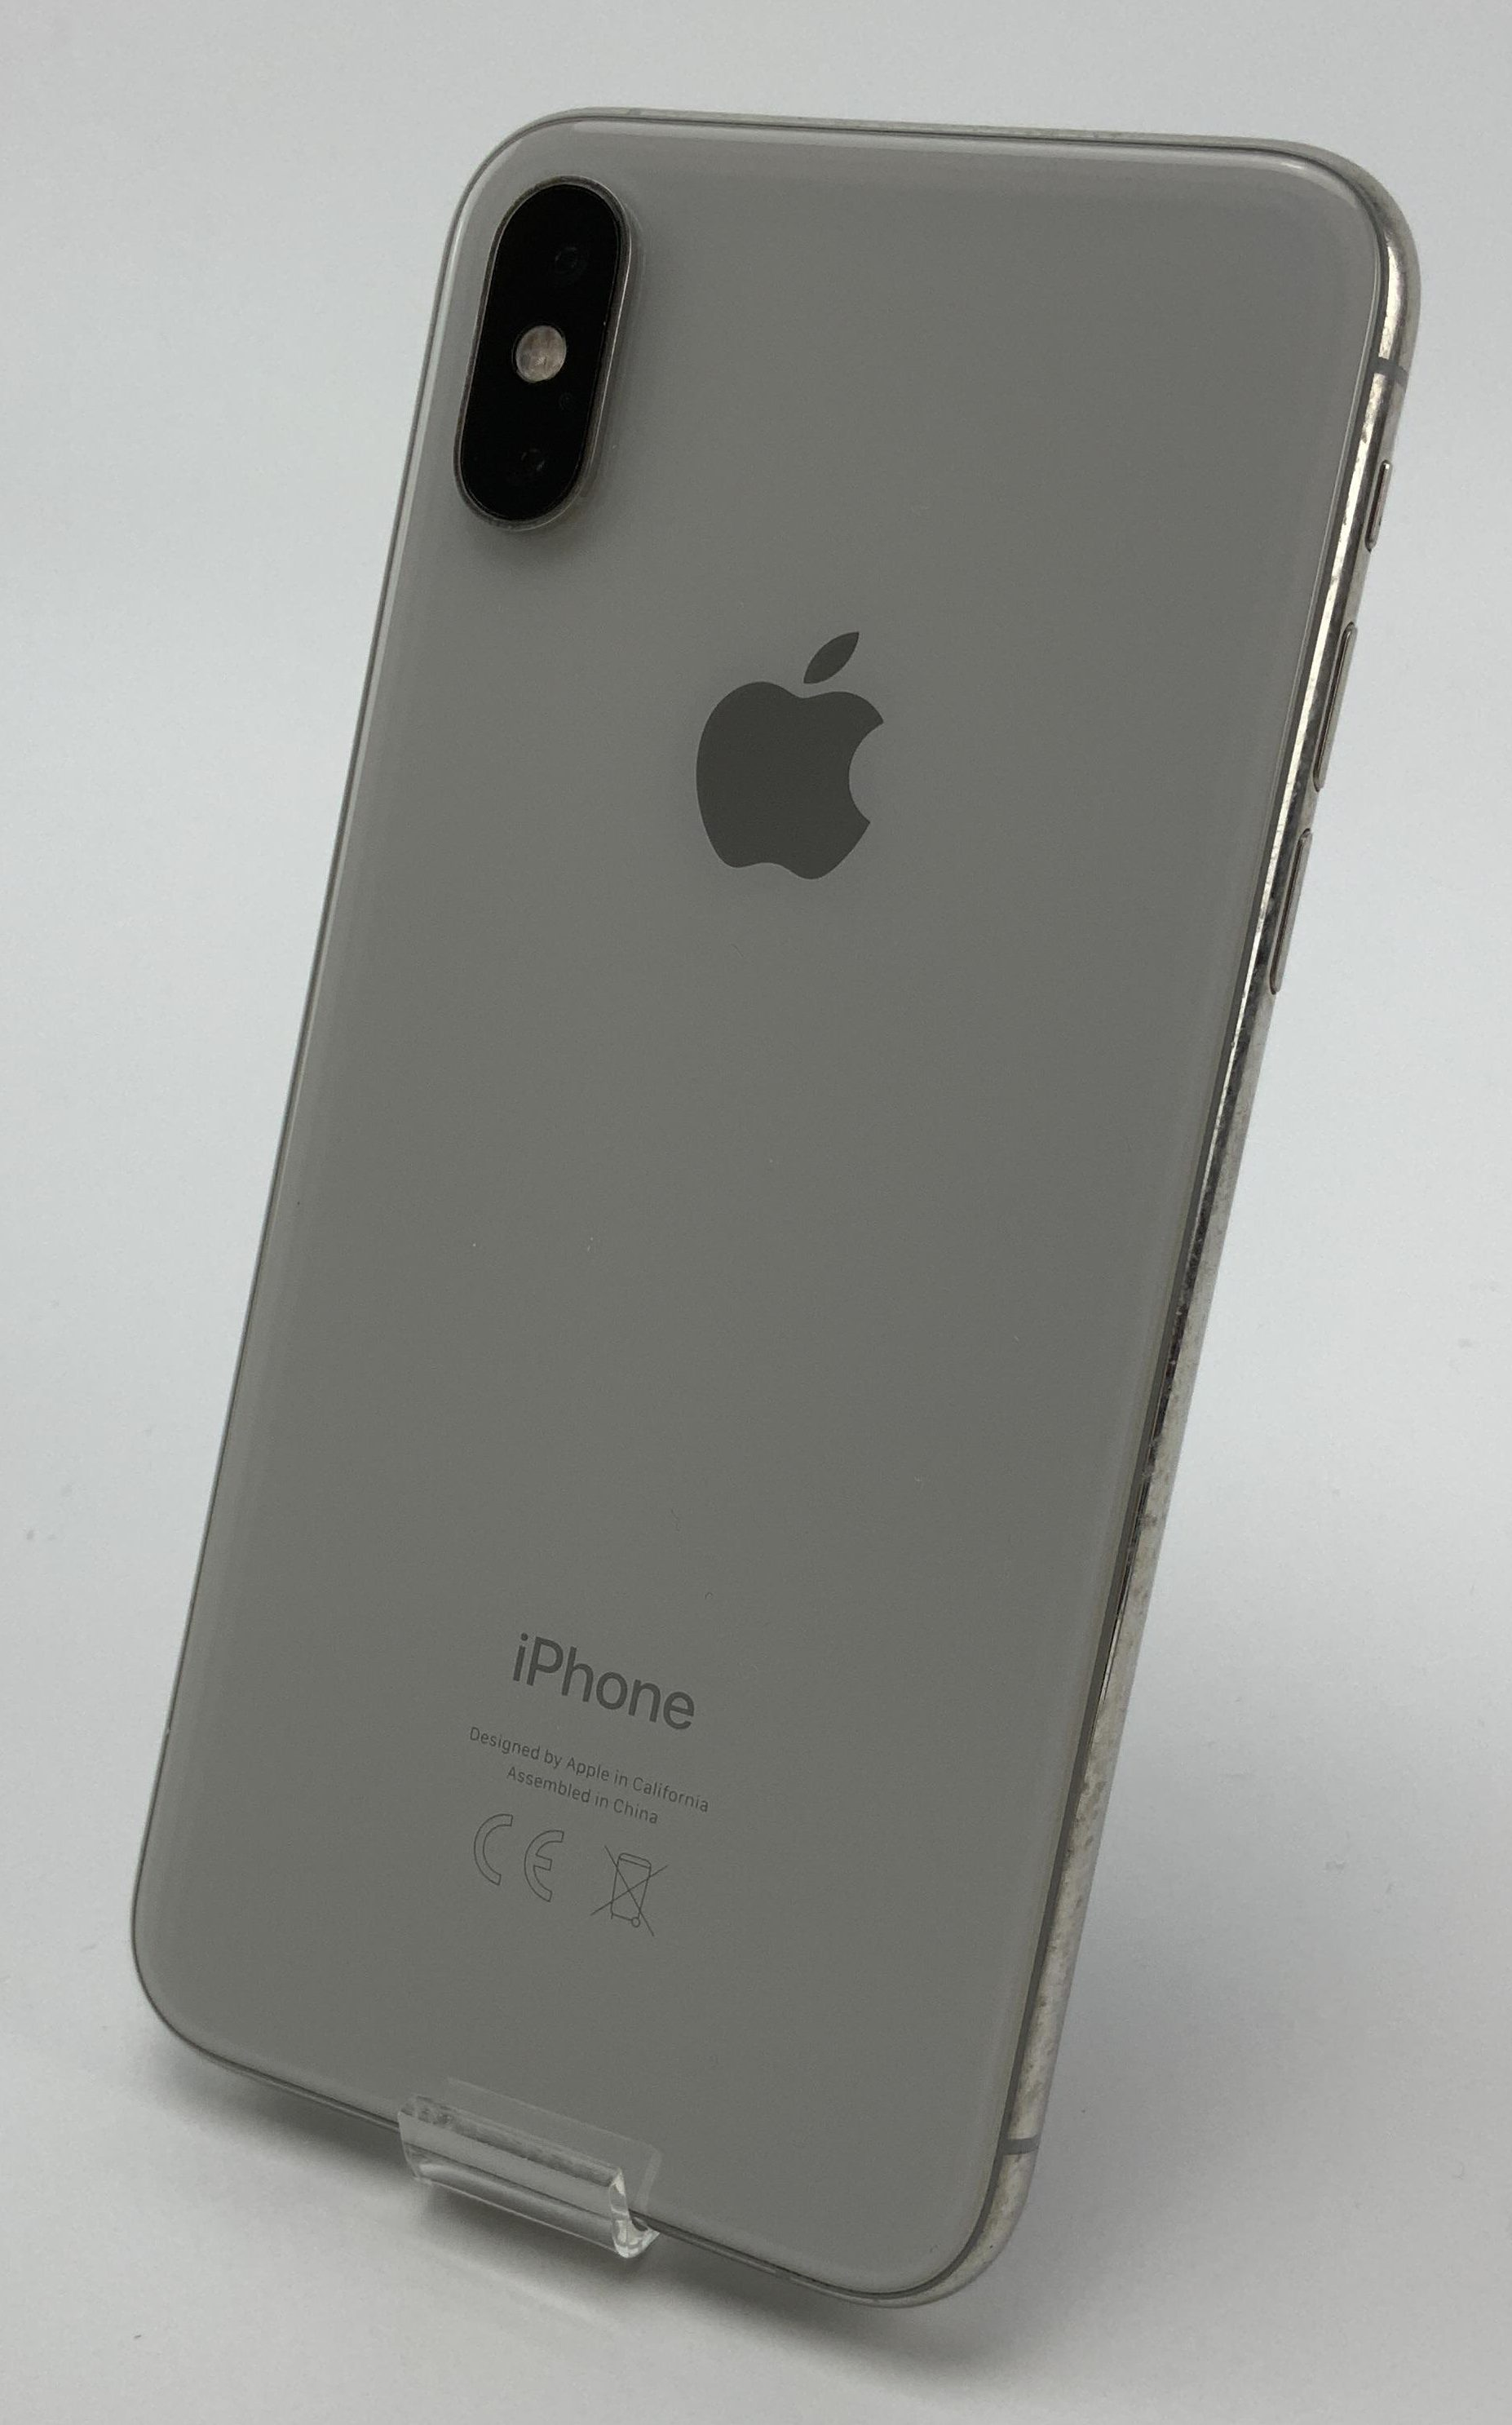 iPhone XS 256GB, 256GB, Silver, imagen 2